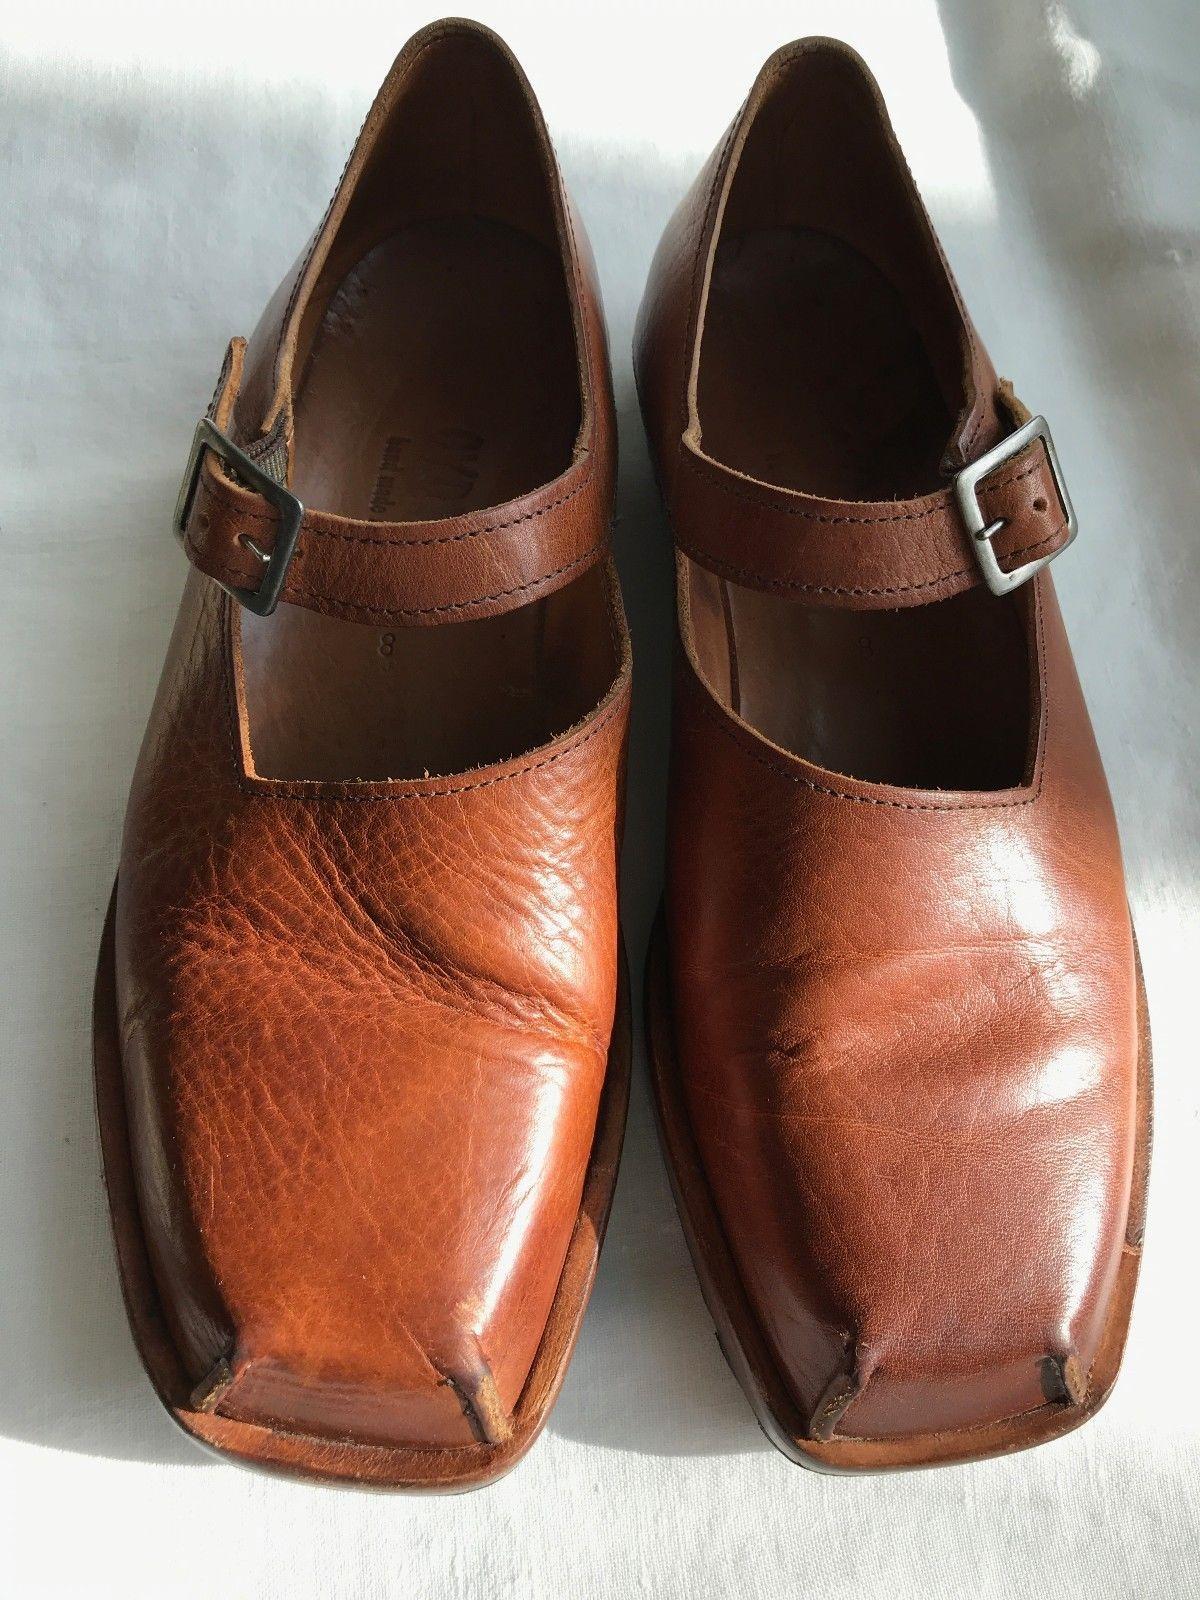 80b99950ca5 cydwoq Women s Mary Jane Shoes Handmade! Great condition! Sz. 38